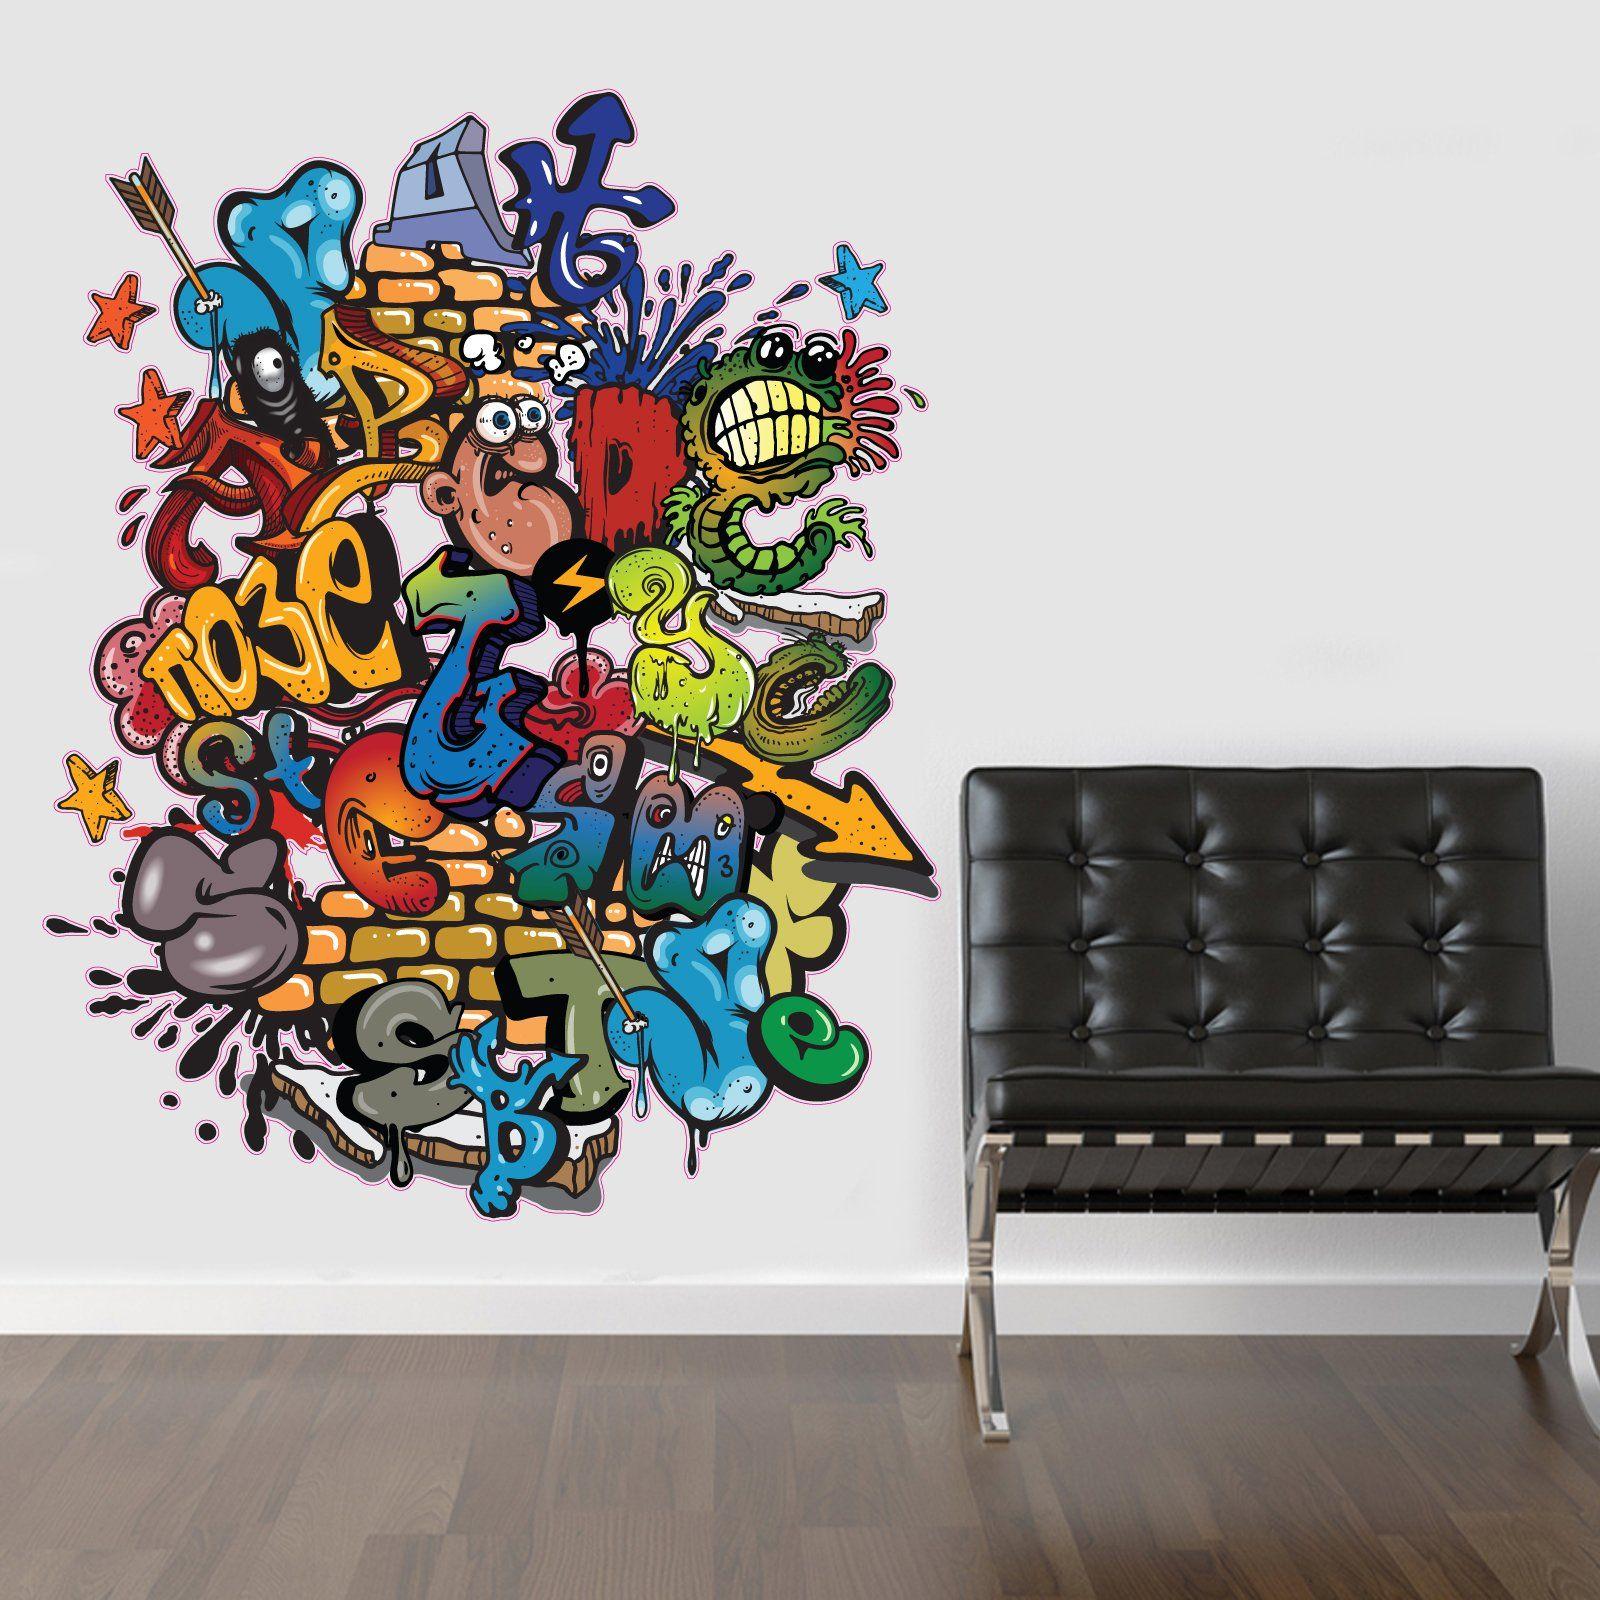 Sticker wall graffiti - Regular Full Colour Graffiti Wall Sticker Wall Decal Wall Art Vinyl Wall Mural Amazon